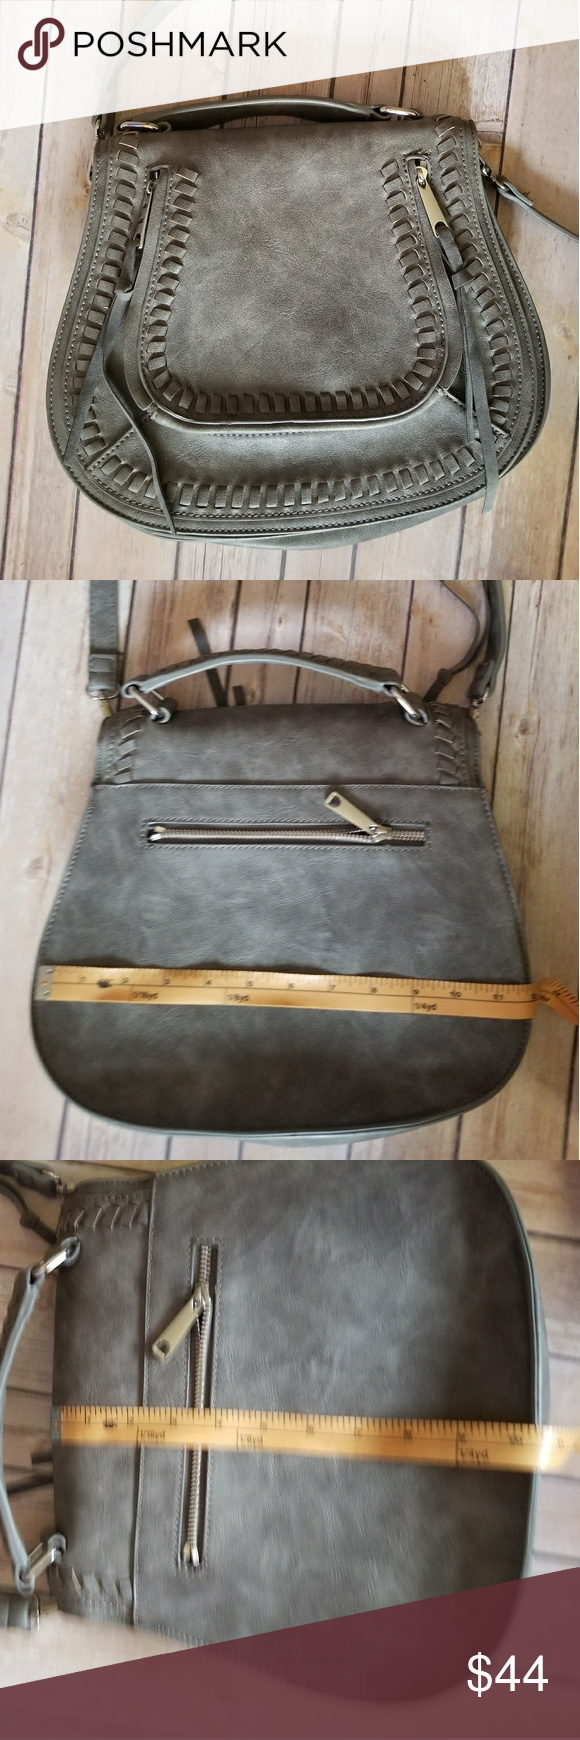 URBAN EXPRESSIONS Saddle Bag